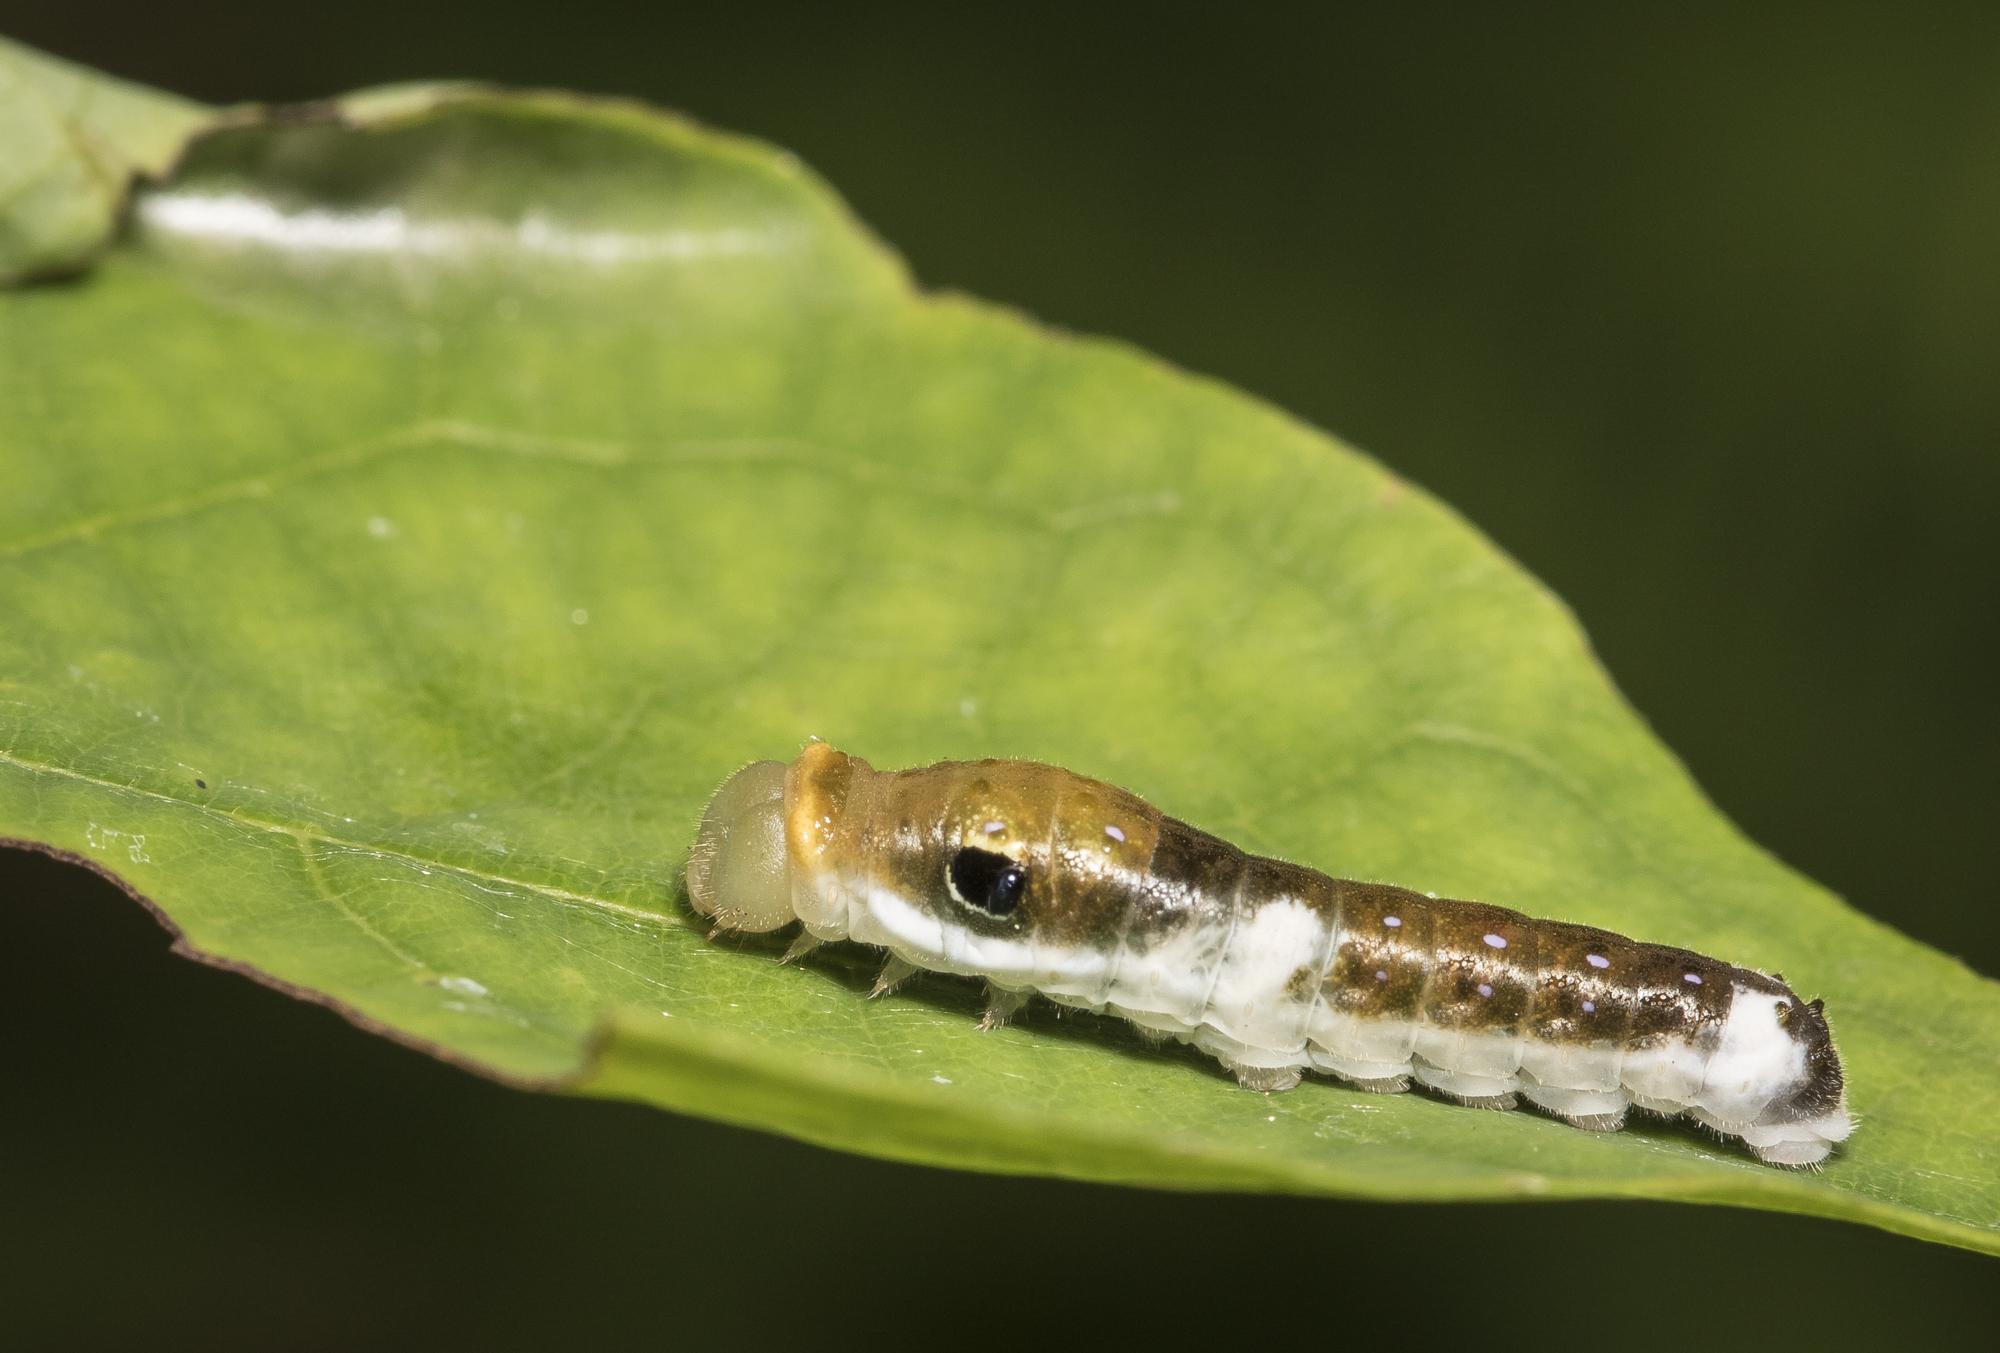 Spicebush swallowtail larva